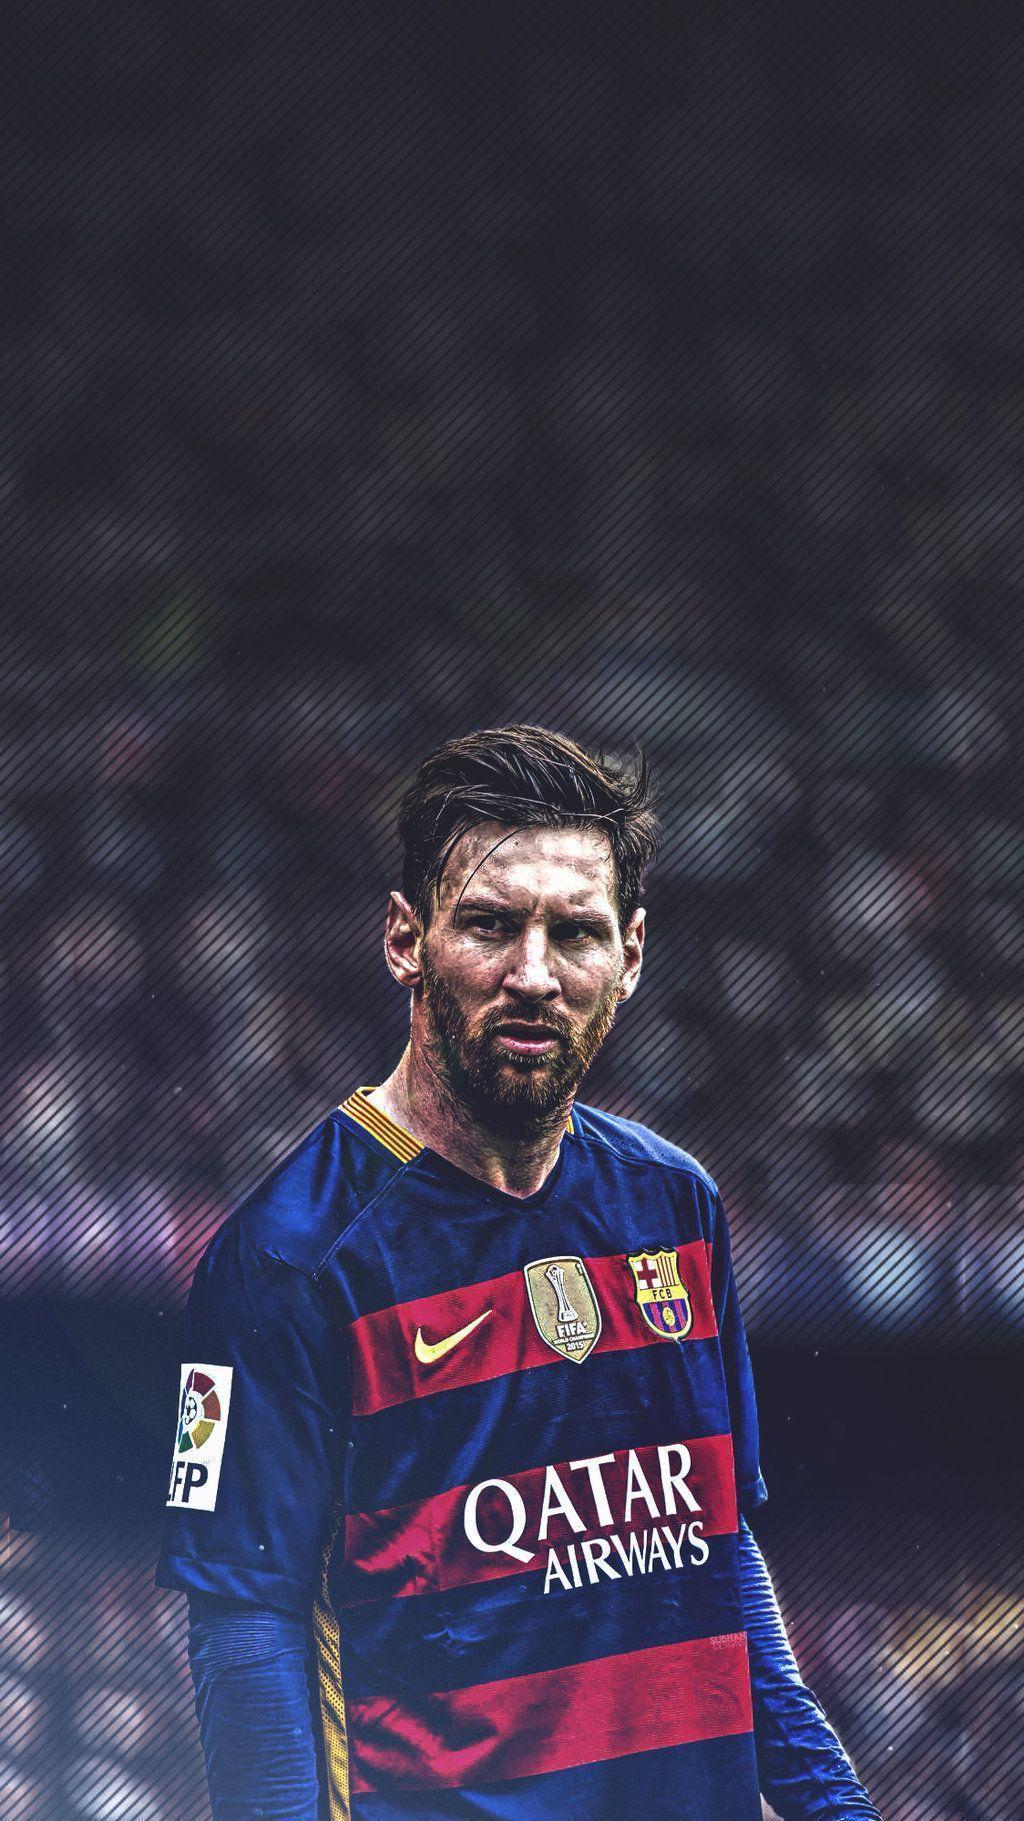 Barcelona Wallpaper Iphone 6 Messi 2017 Wallpapers Wallpaper Cave